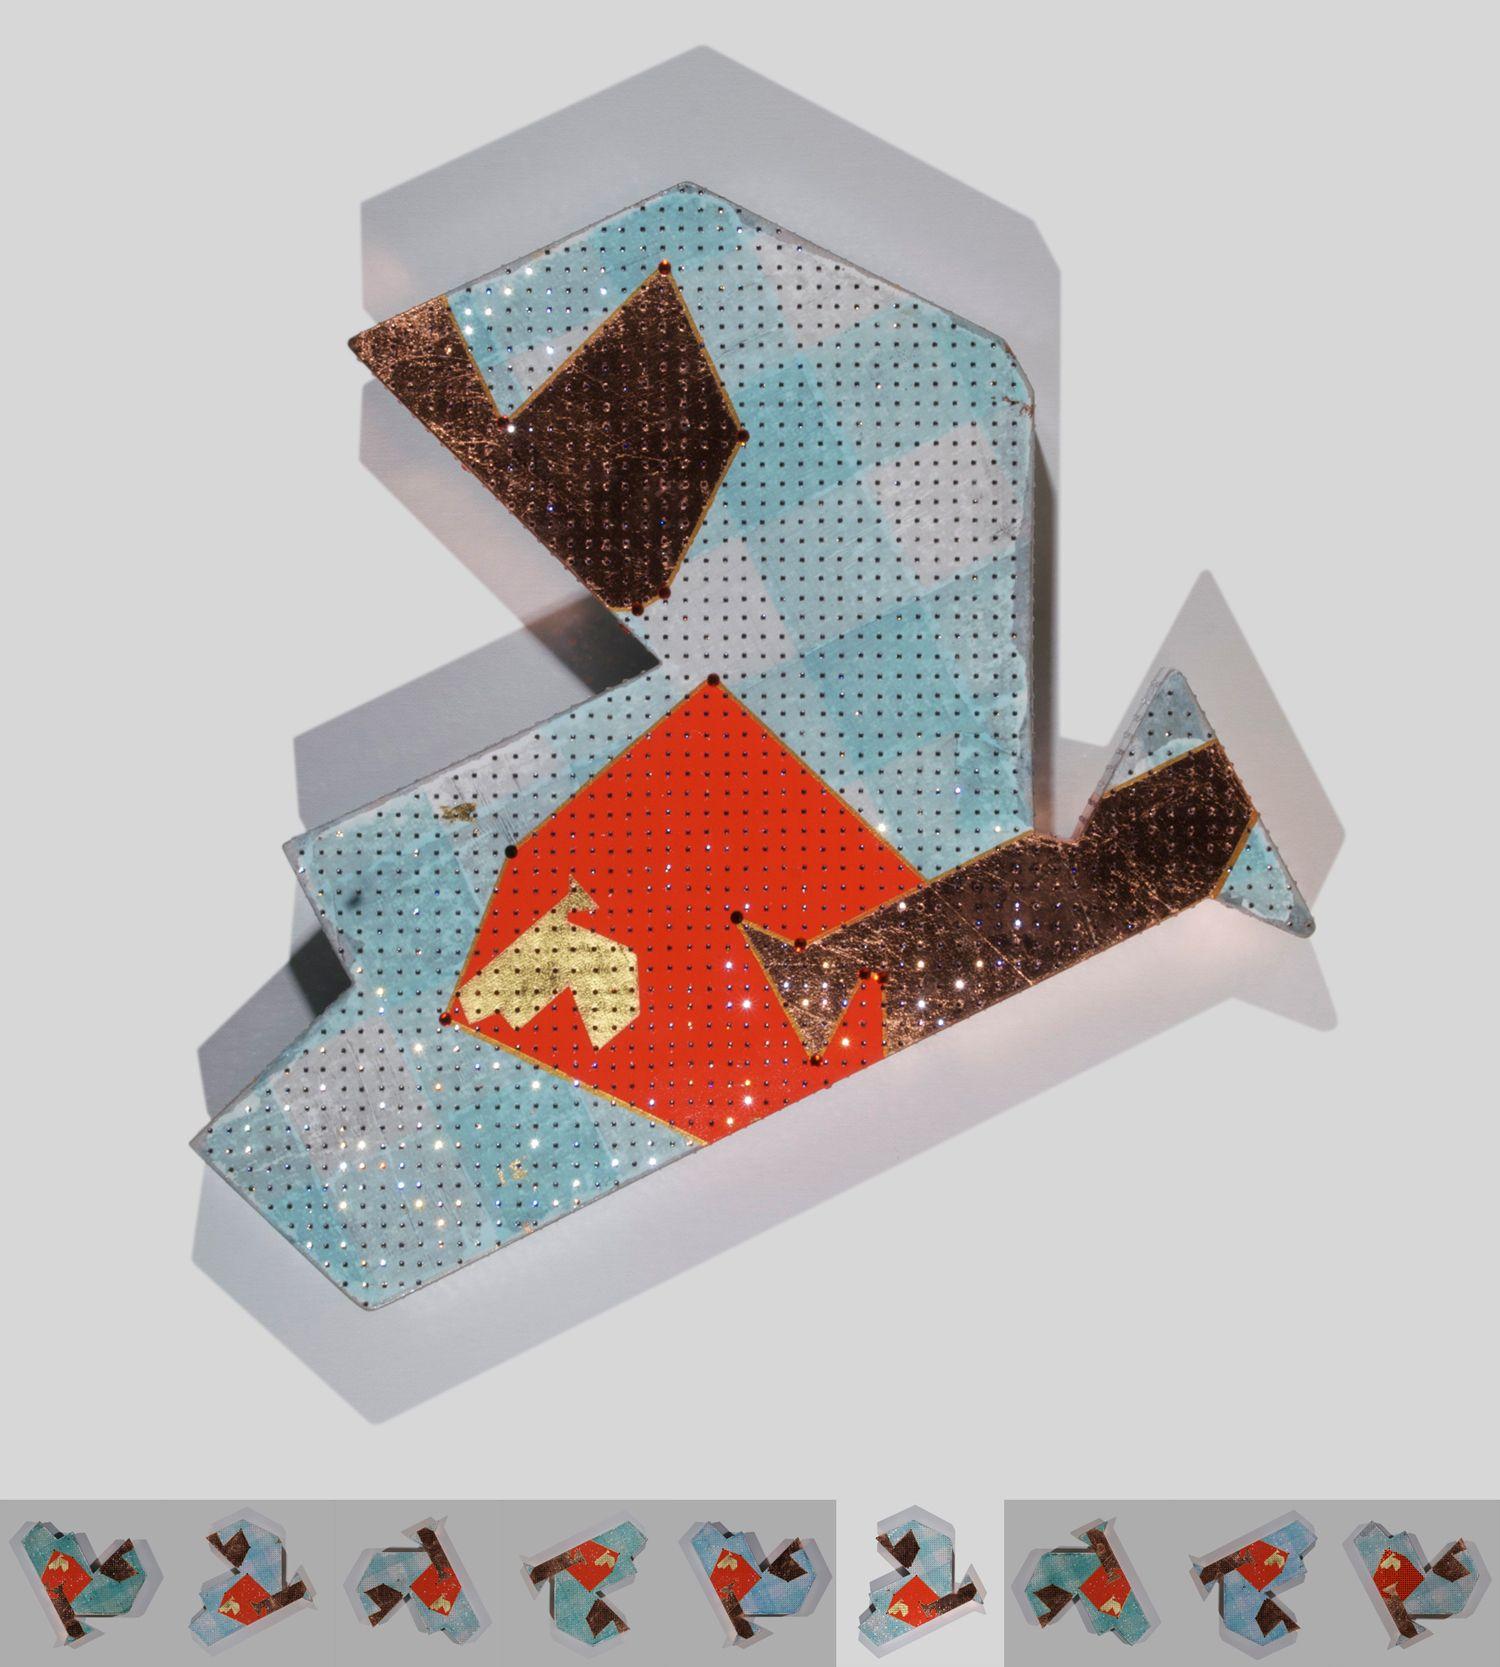 To gild the grey B. Cristales, pan de cobre, pan de oro, acrílico y papel de seda sobre cartón. 3,7 x 40 x 40 cm. 2010.